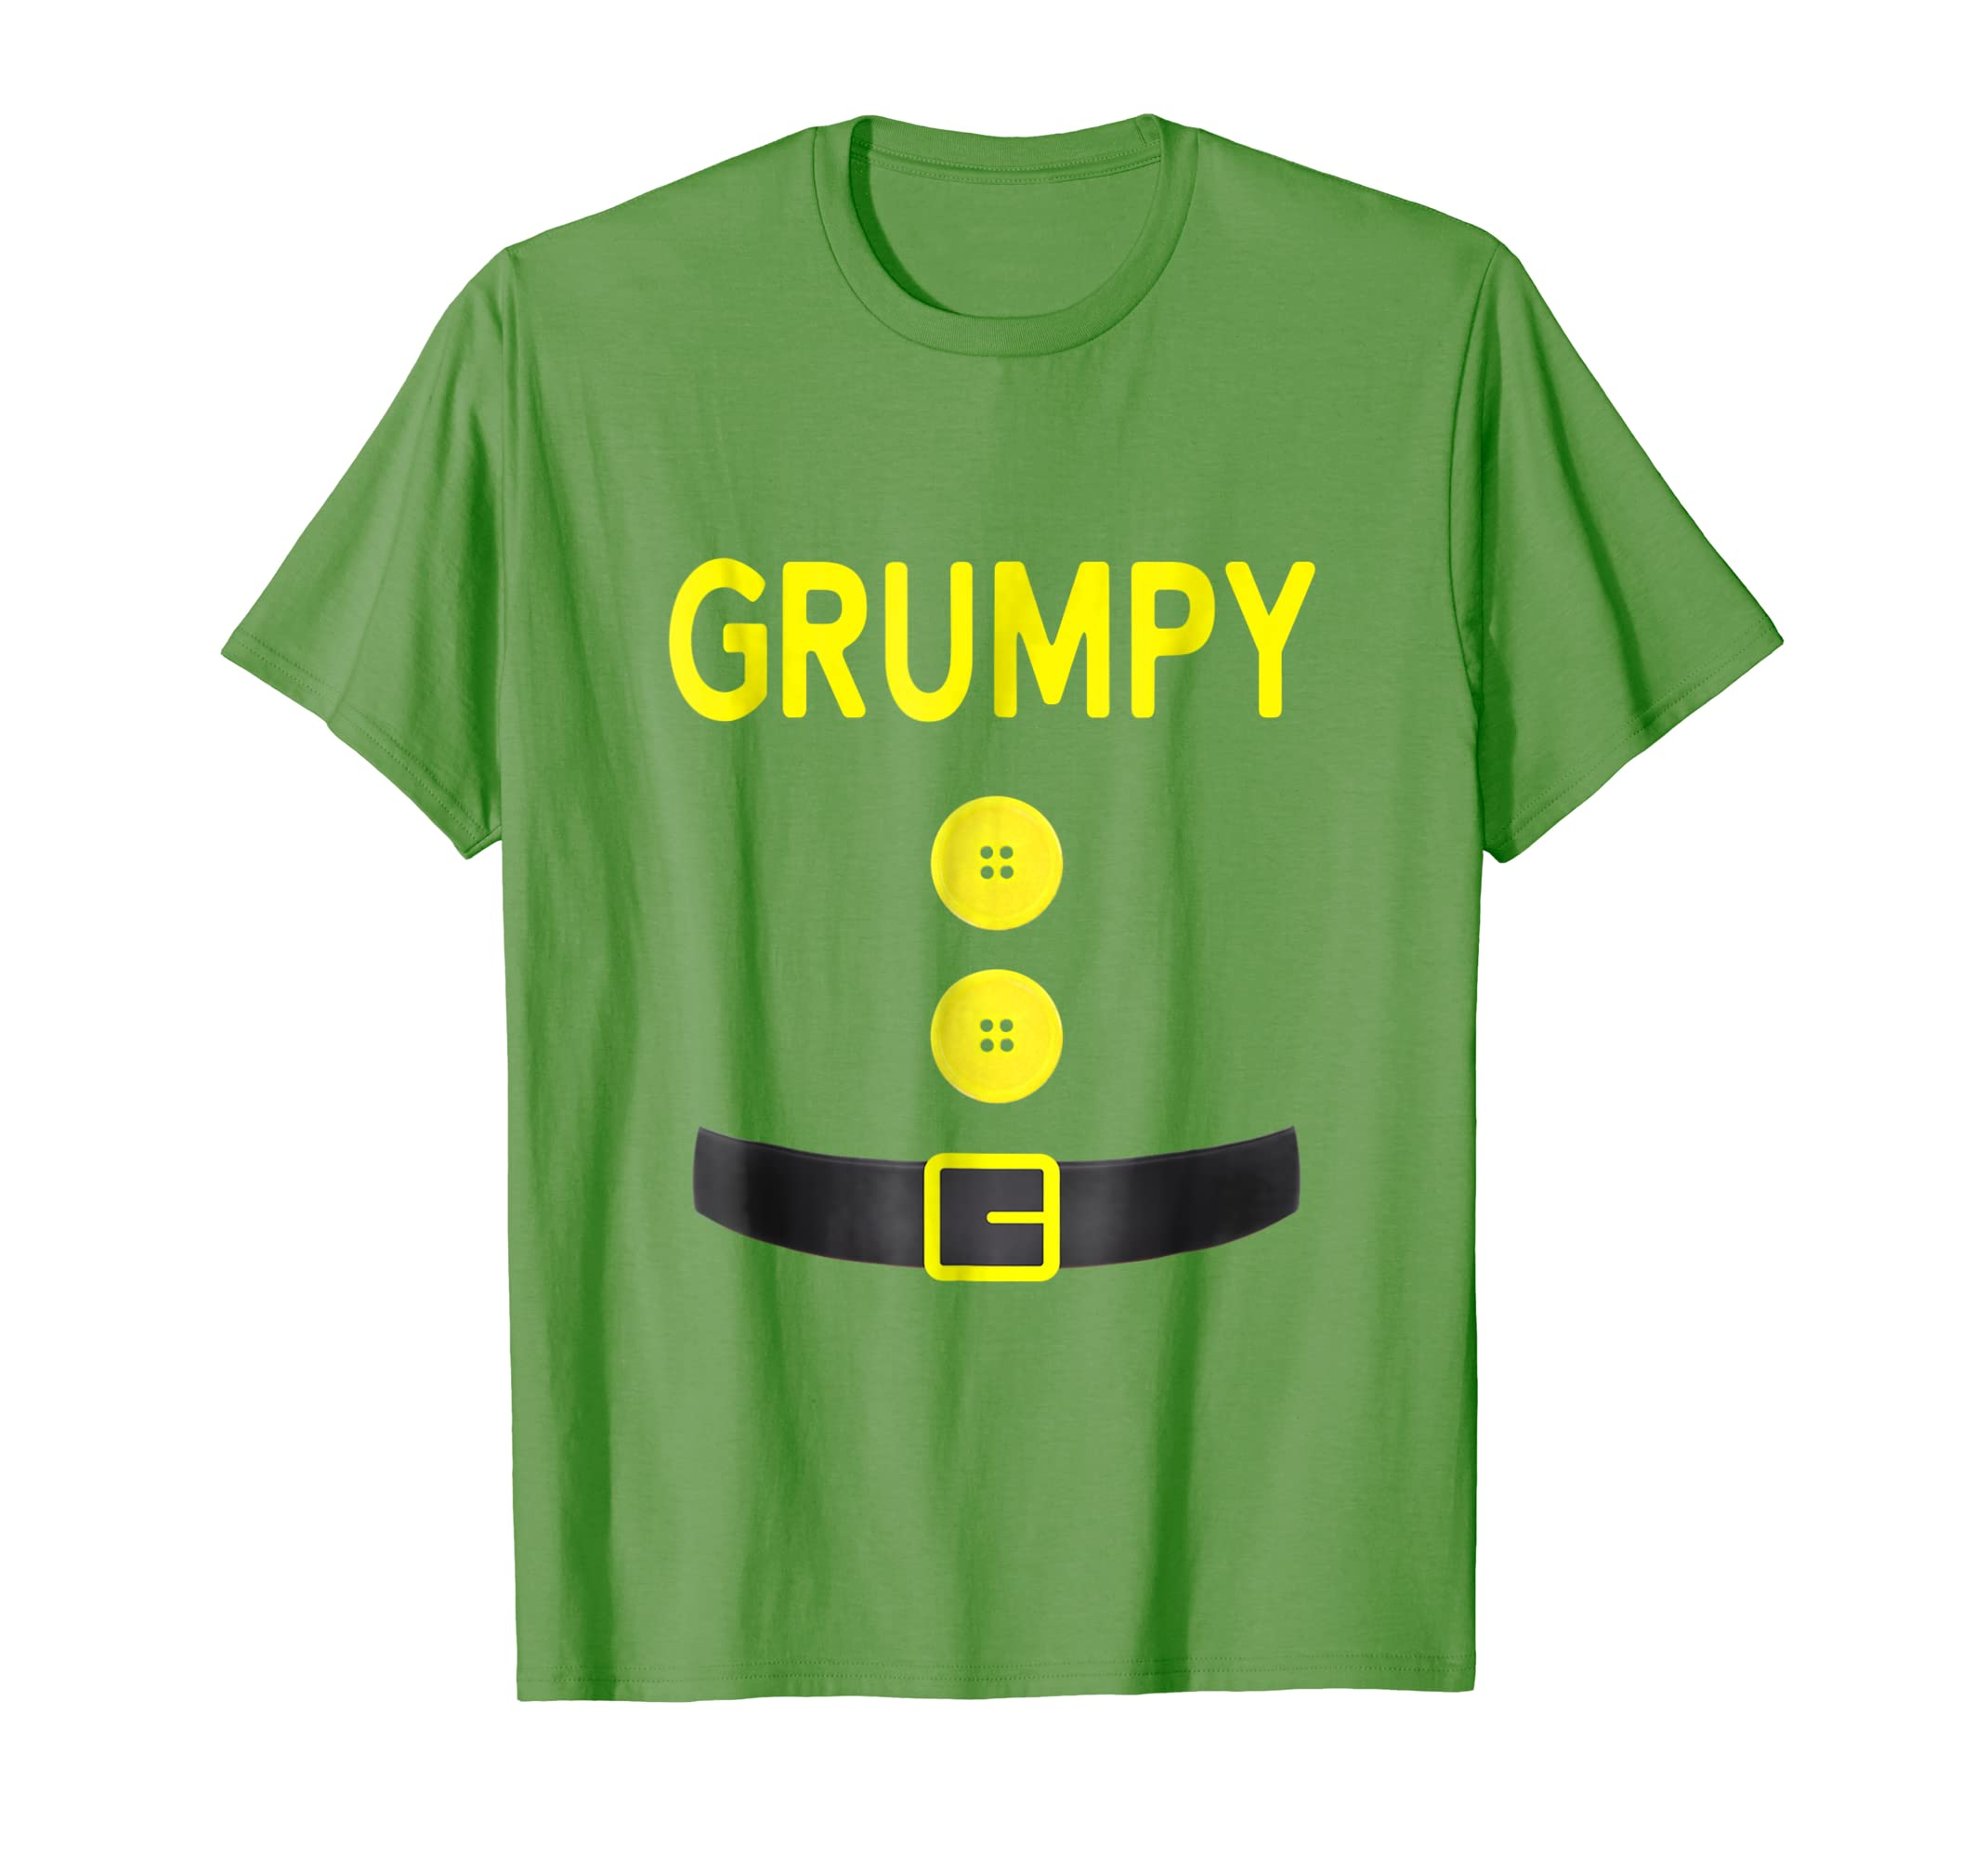 Grumpy Dwarf Costume T Shirt Funny Halloween Gifts-Teechatpro